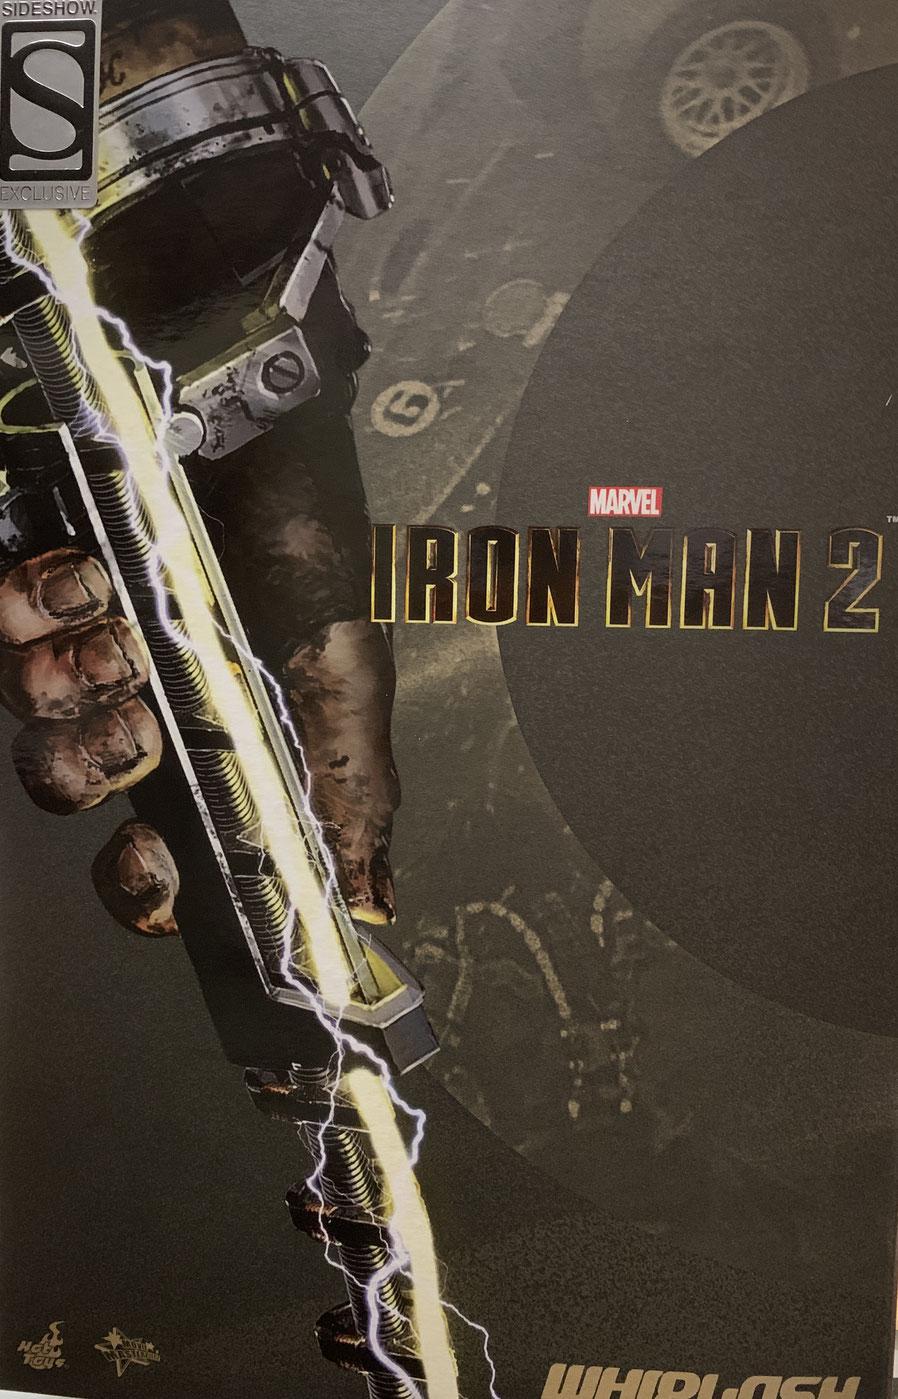 Whiplash 1/6 Iron Man 2 Movie Masterpiece Marvel Actionfigur 2020 Toy Fair Exclusive 30cm Hot Toys